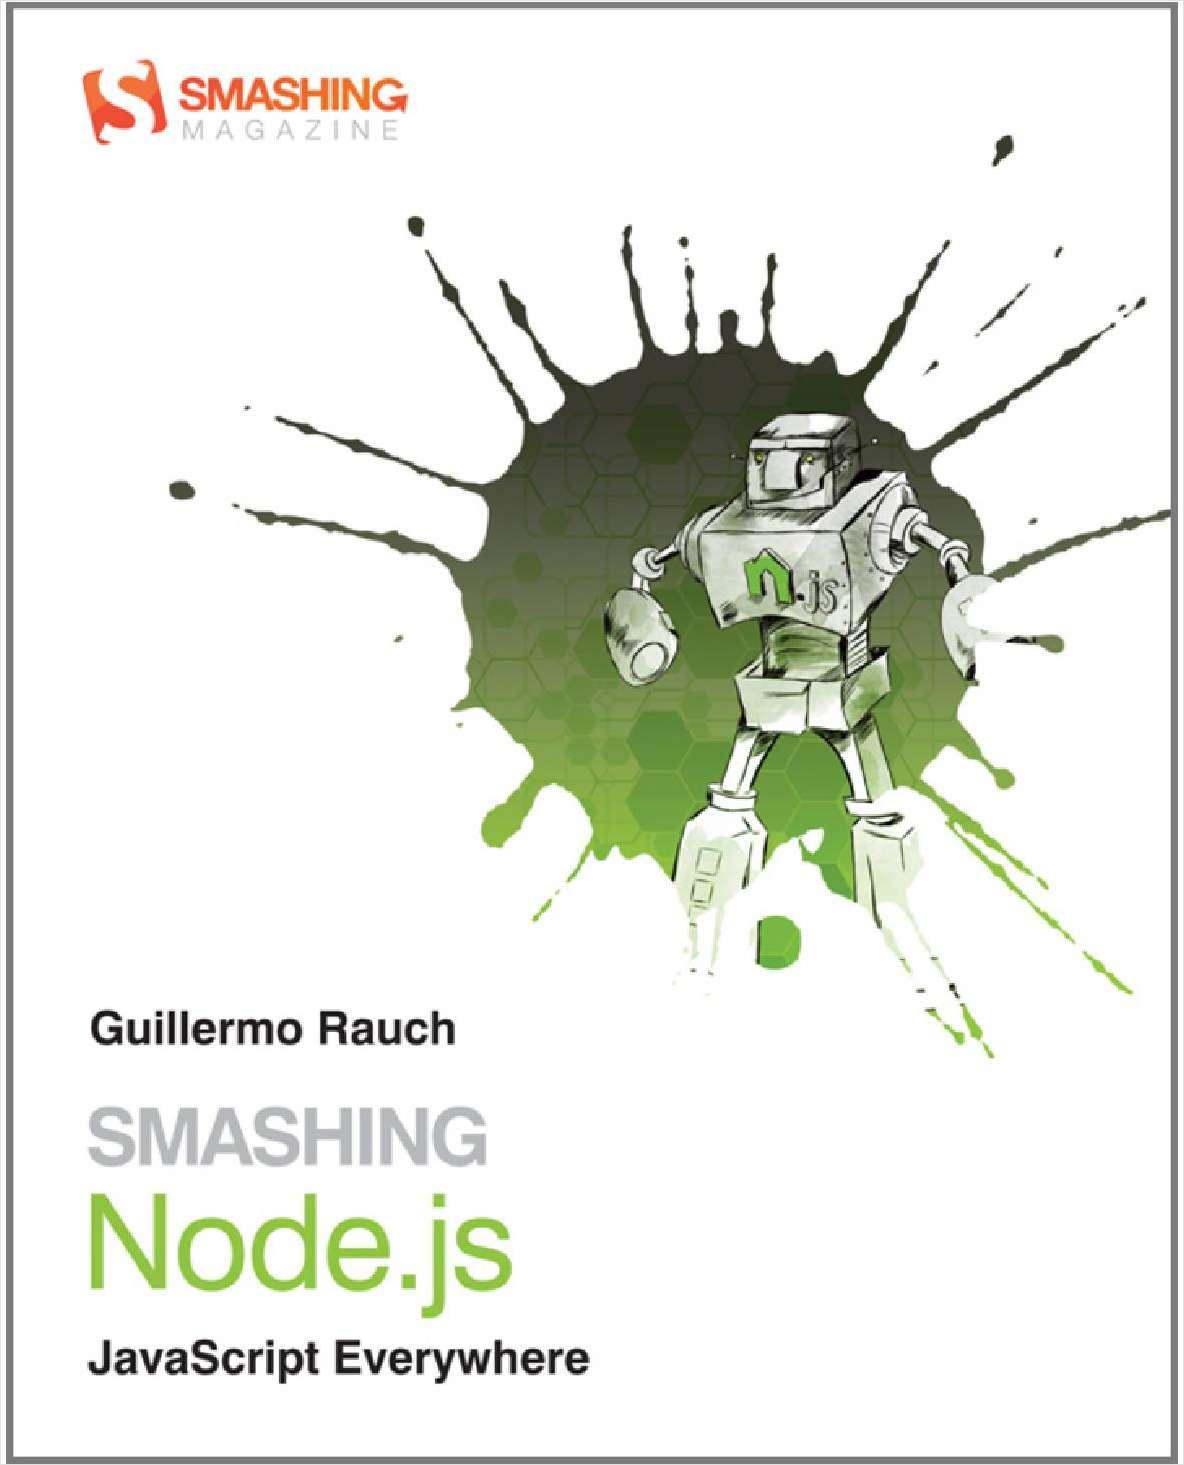 Smashing Node.js: JavaScript Everywhere--Free Sample Chapters